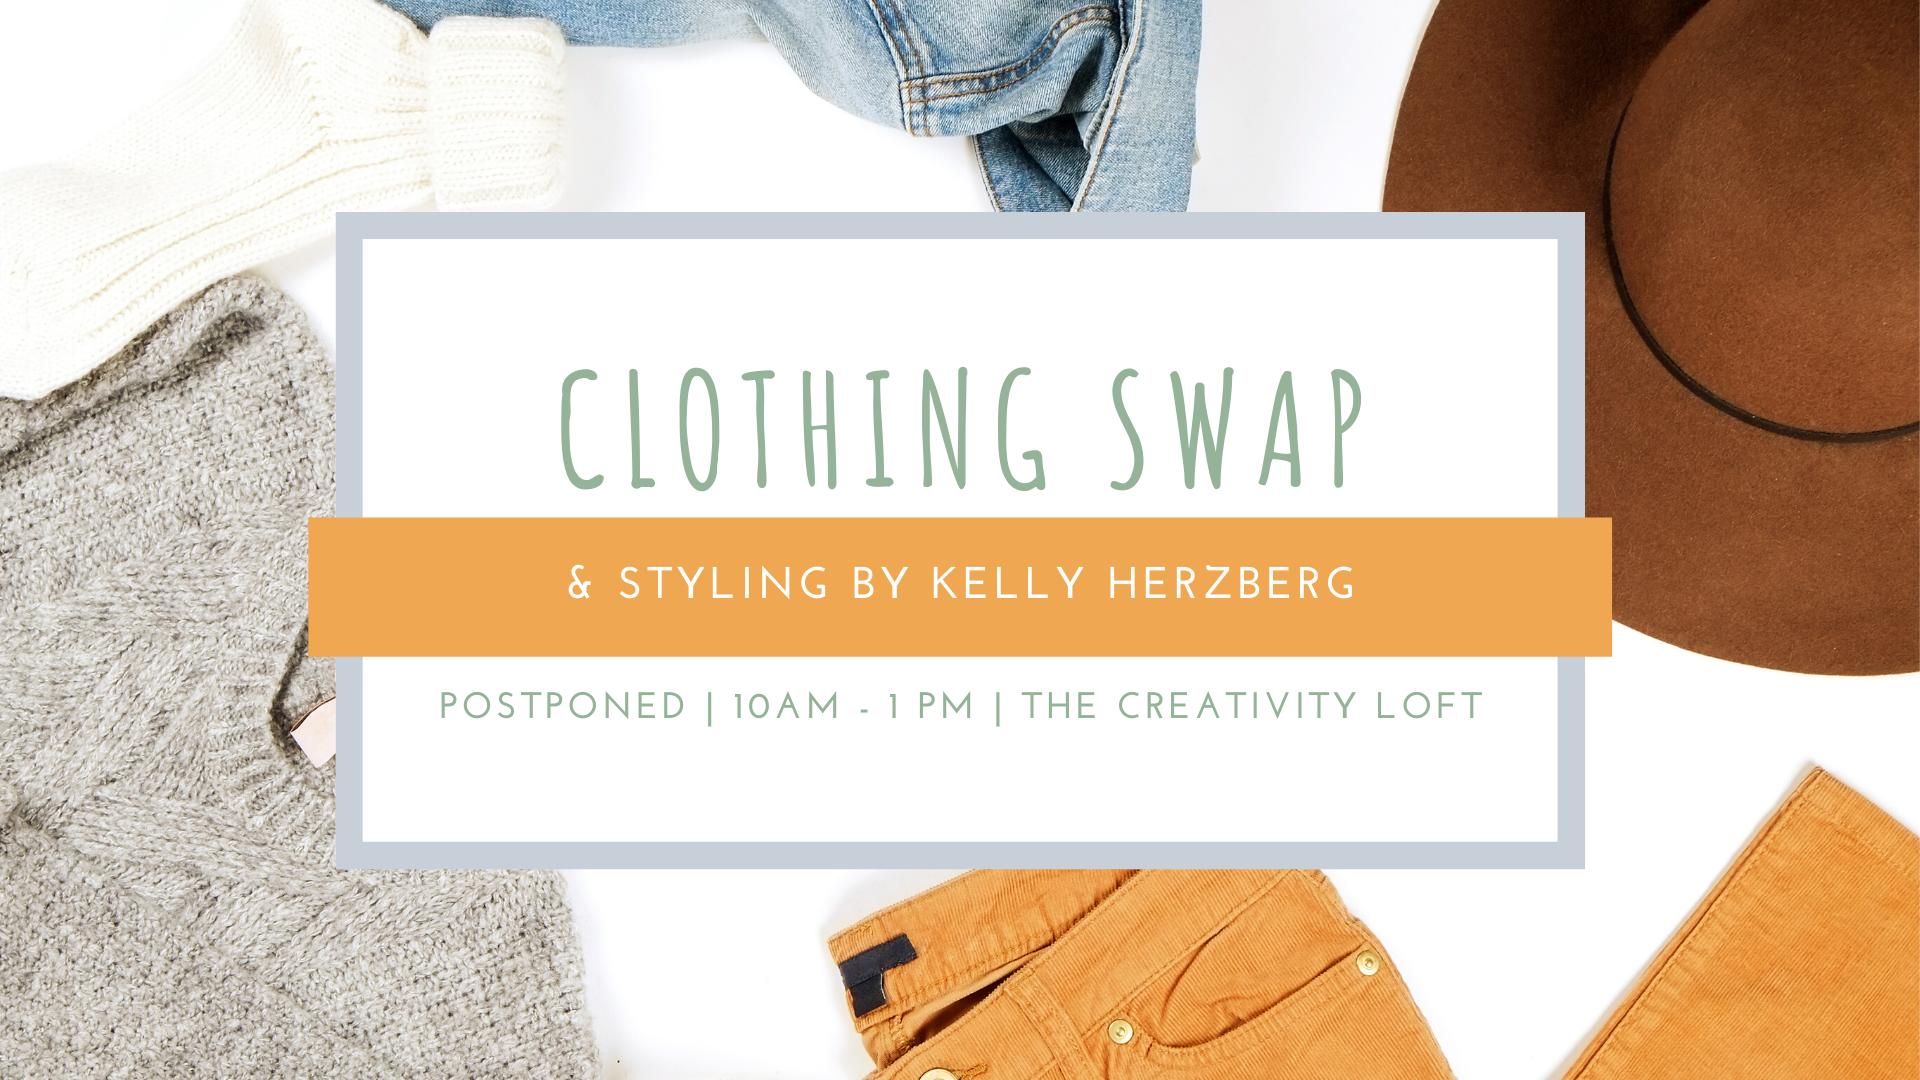 Clothing Swap Postponed